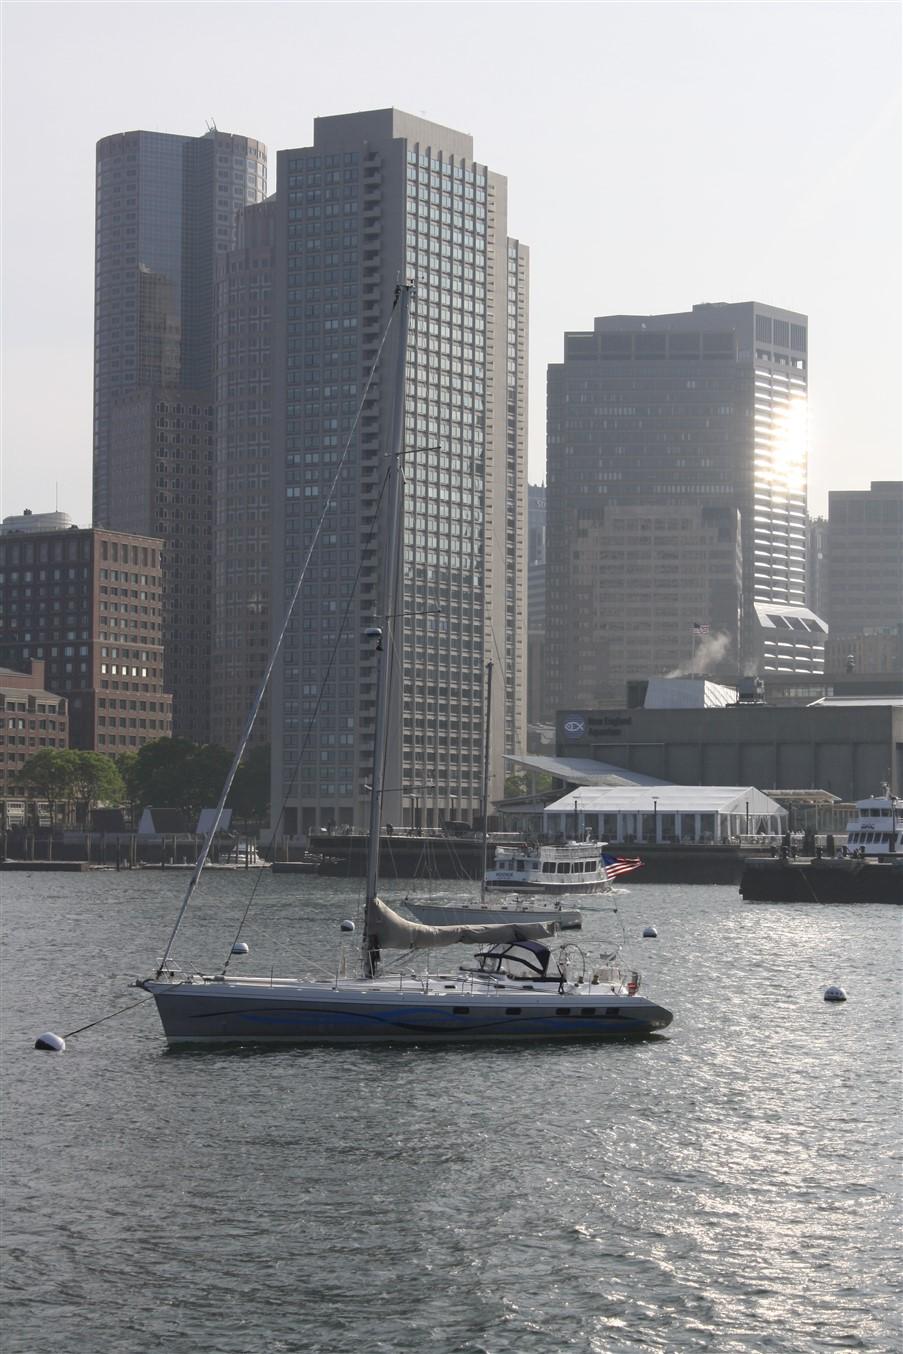 2010 05 14 Boston 143.jpg